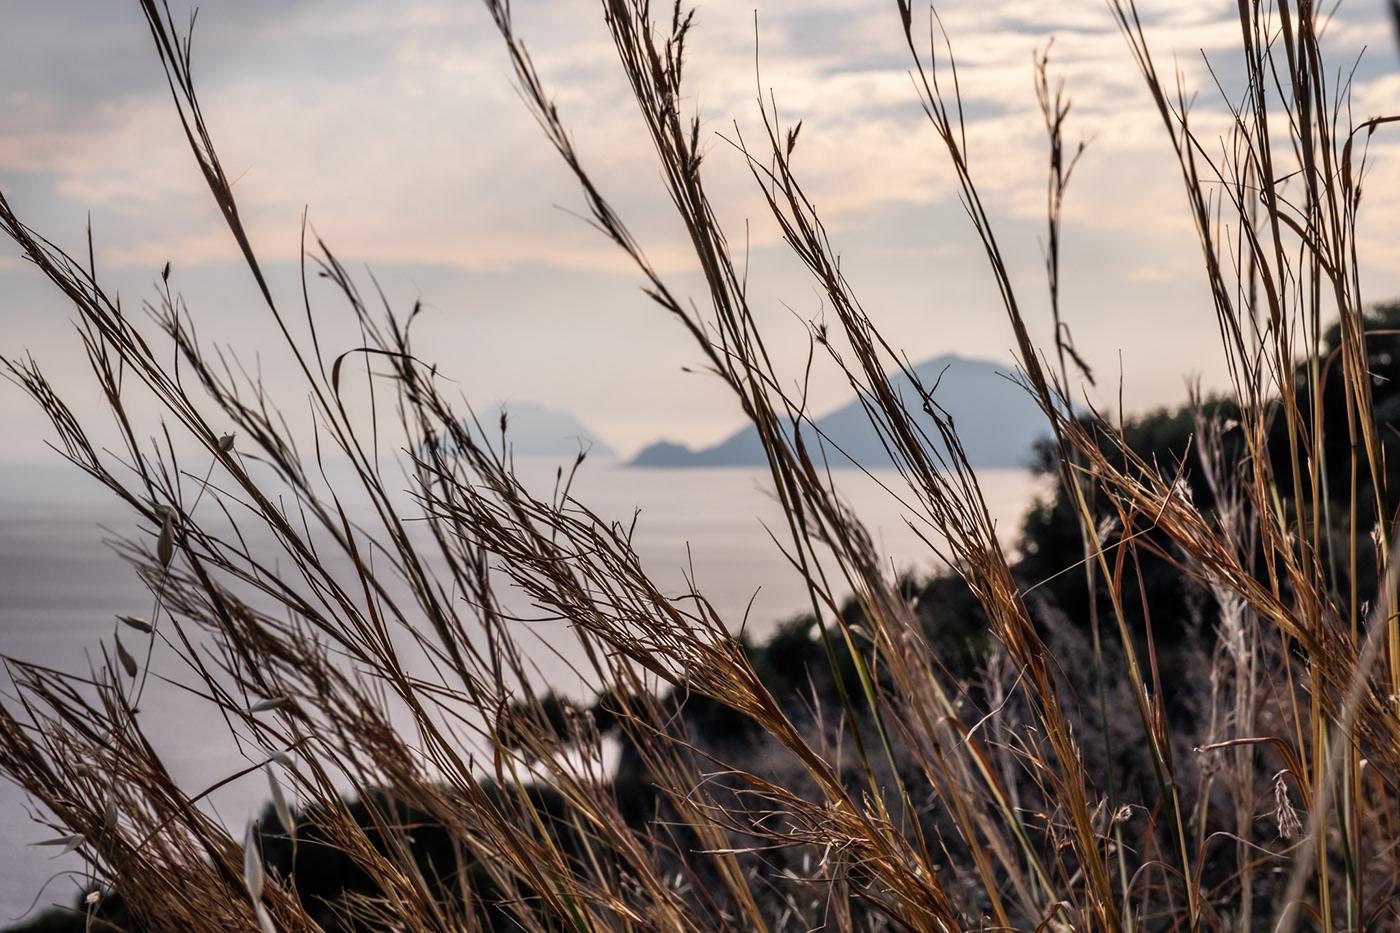 aeolianislands Travel sea isole islands trip adventure Beautiful landscapes